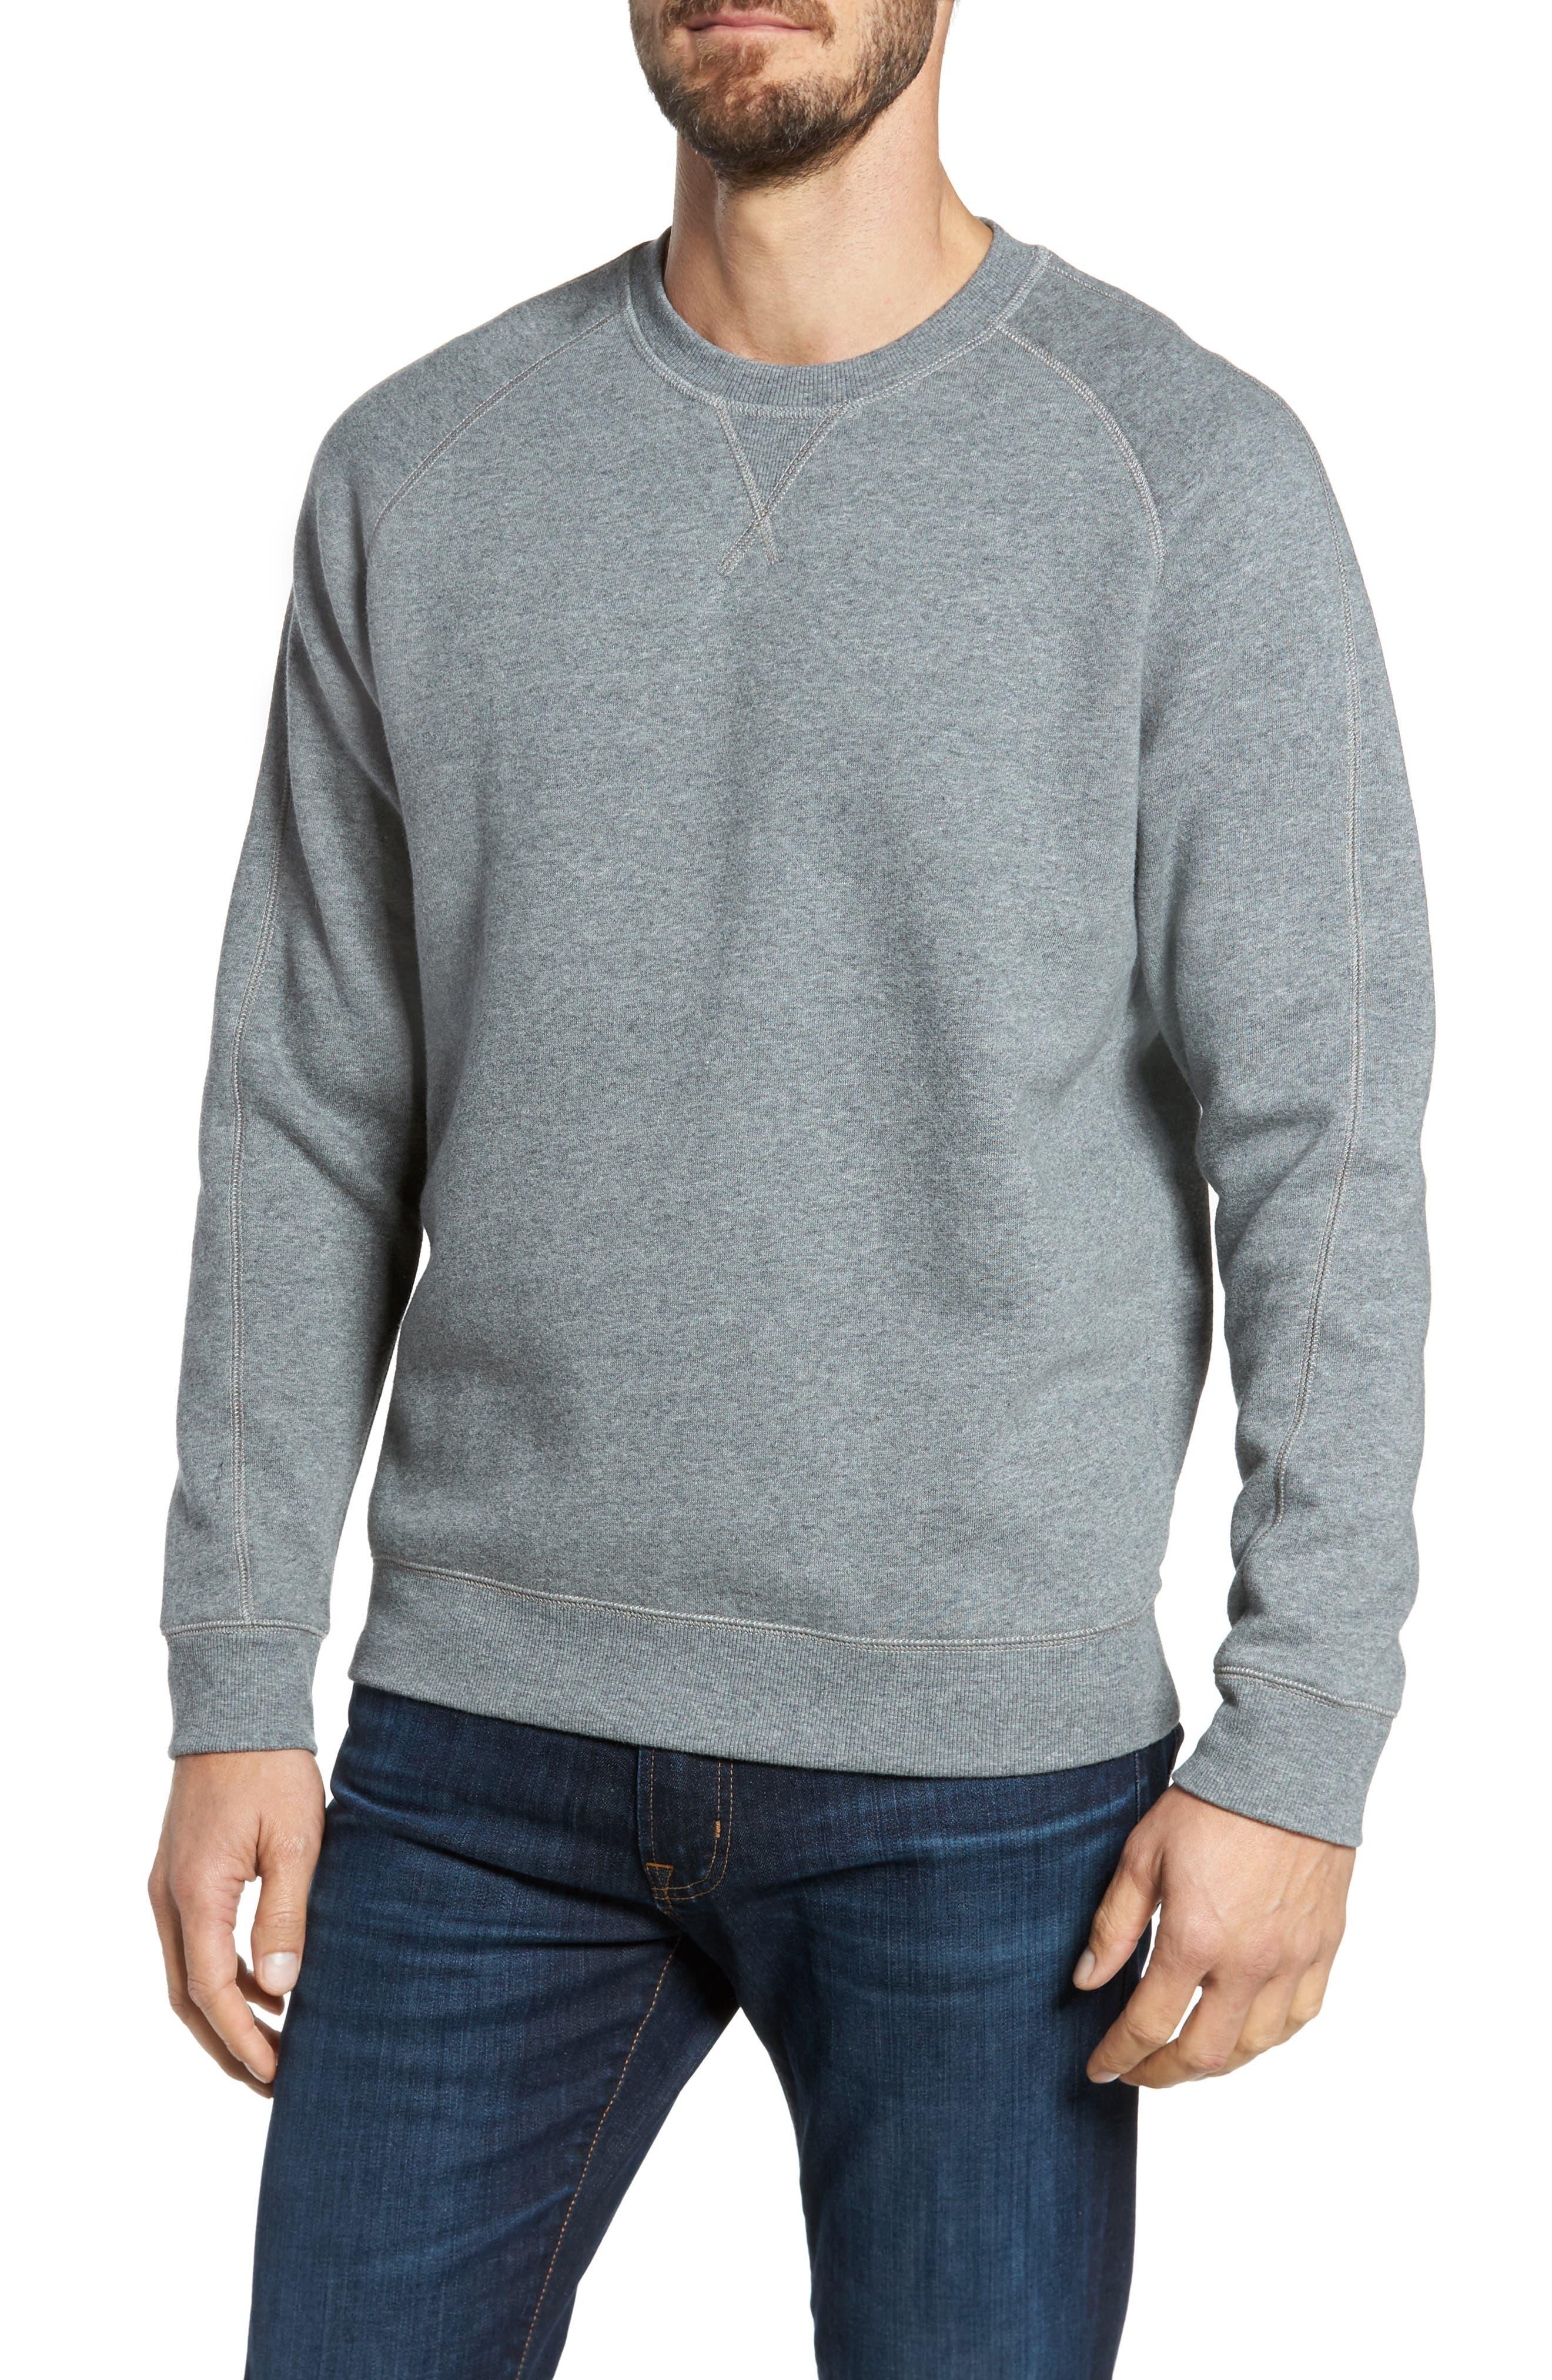 Fleece Sweatshirt,                         Main,                         color, Grey Paloma Heather